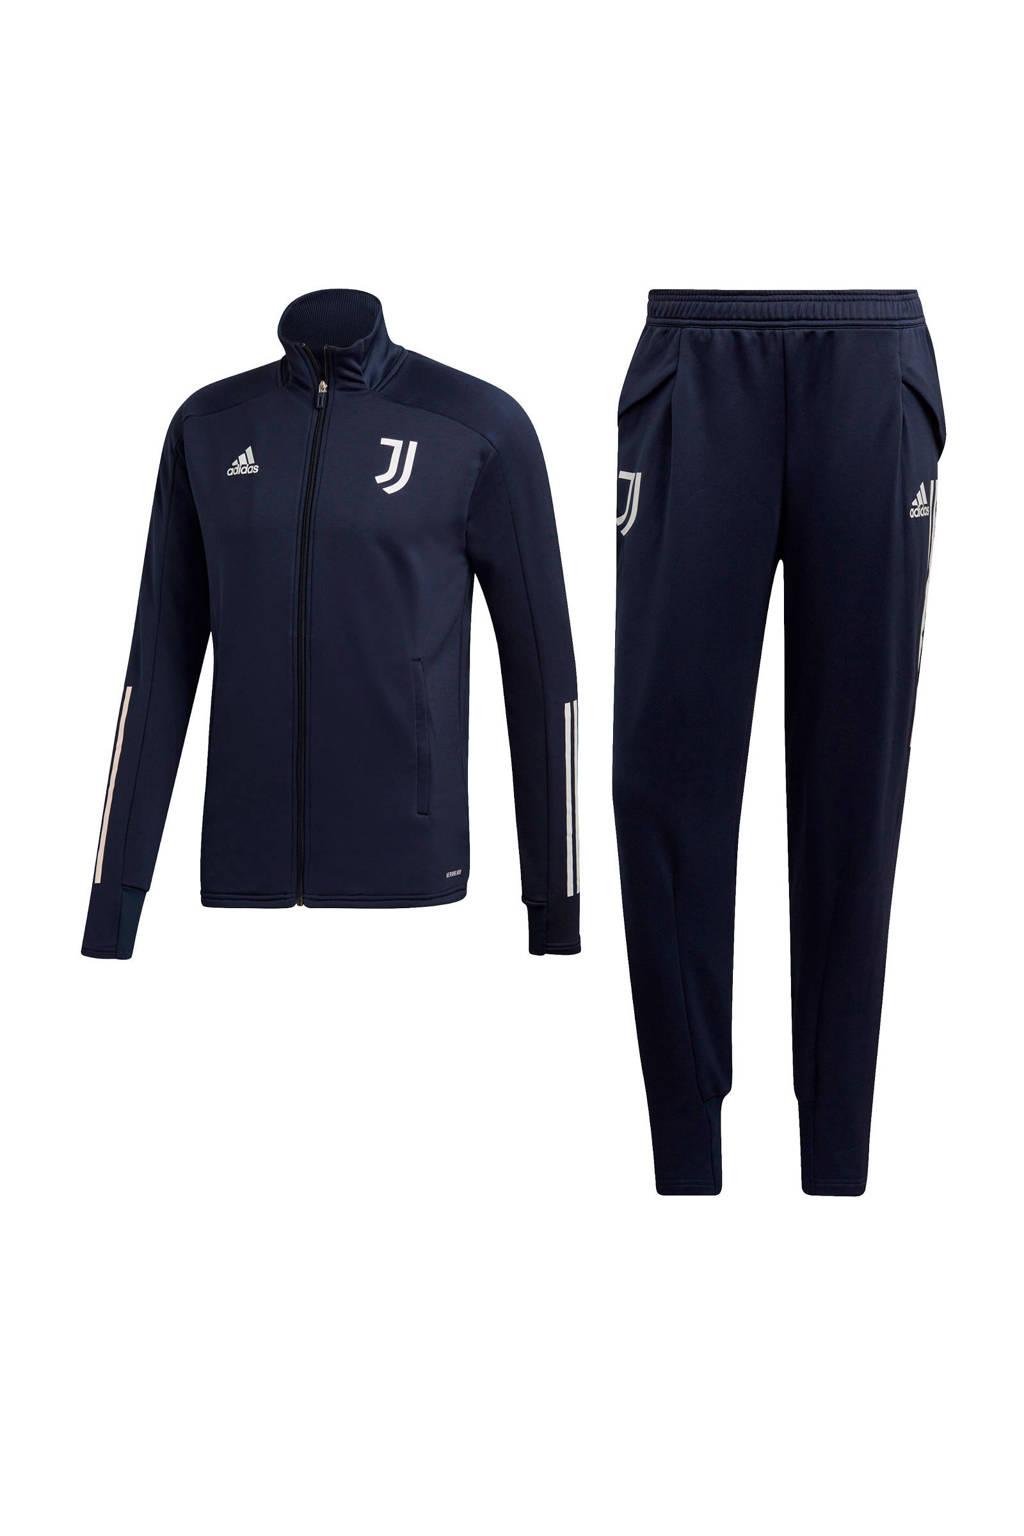 adidas Performance Senior Juventus trainingspak donkerblauw, Donkerblauw